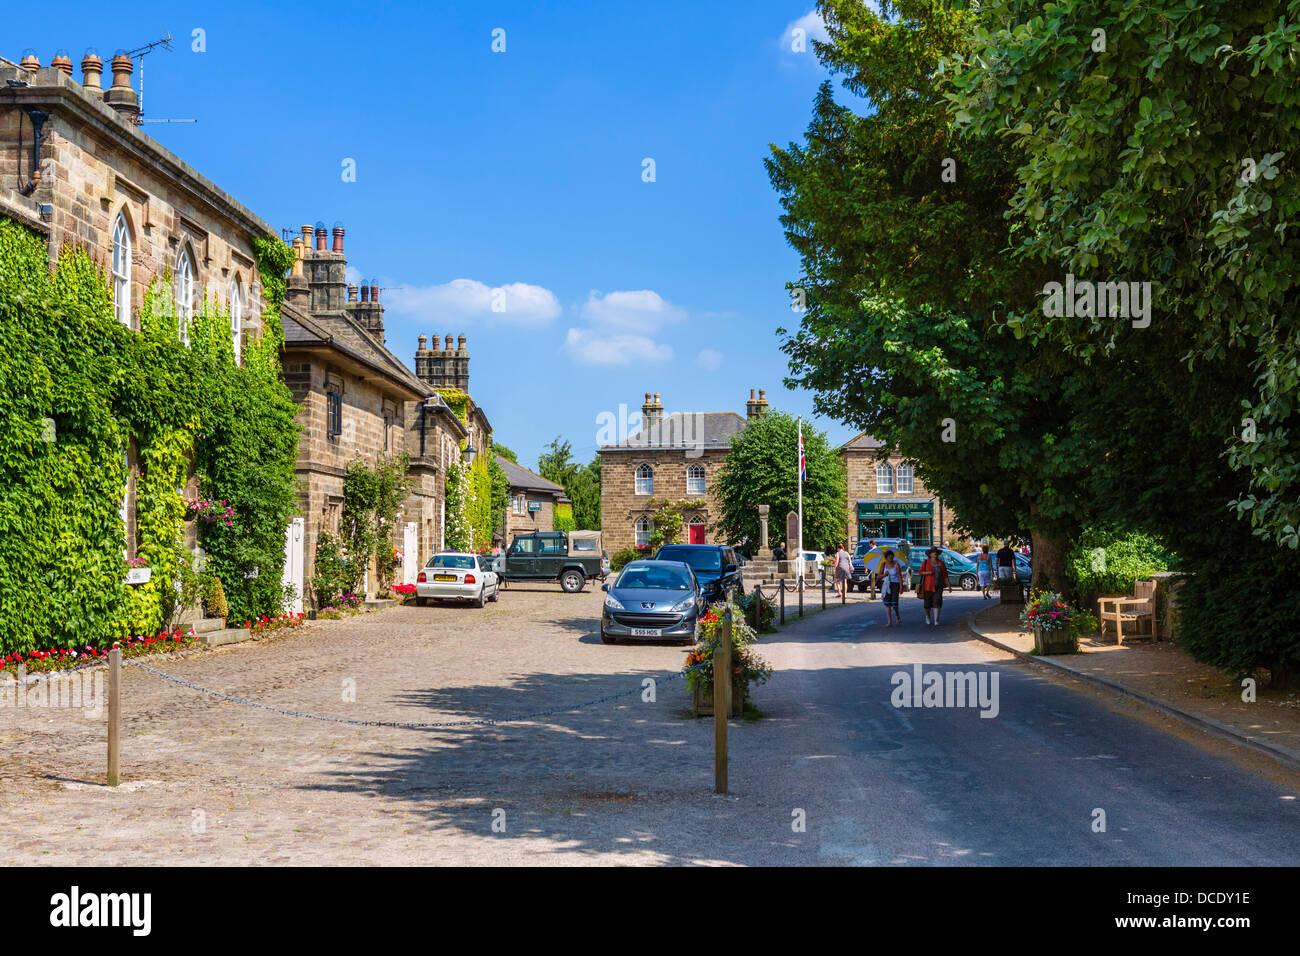 Centre du village pittoresque de Ripley, North Yorkshire, England, UK Photo Stock